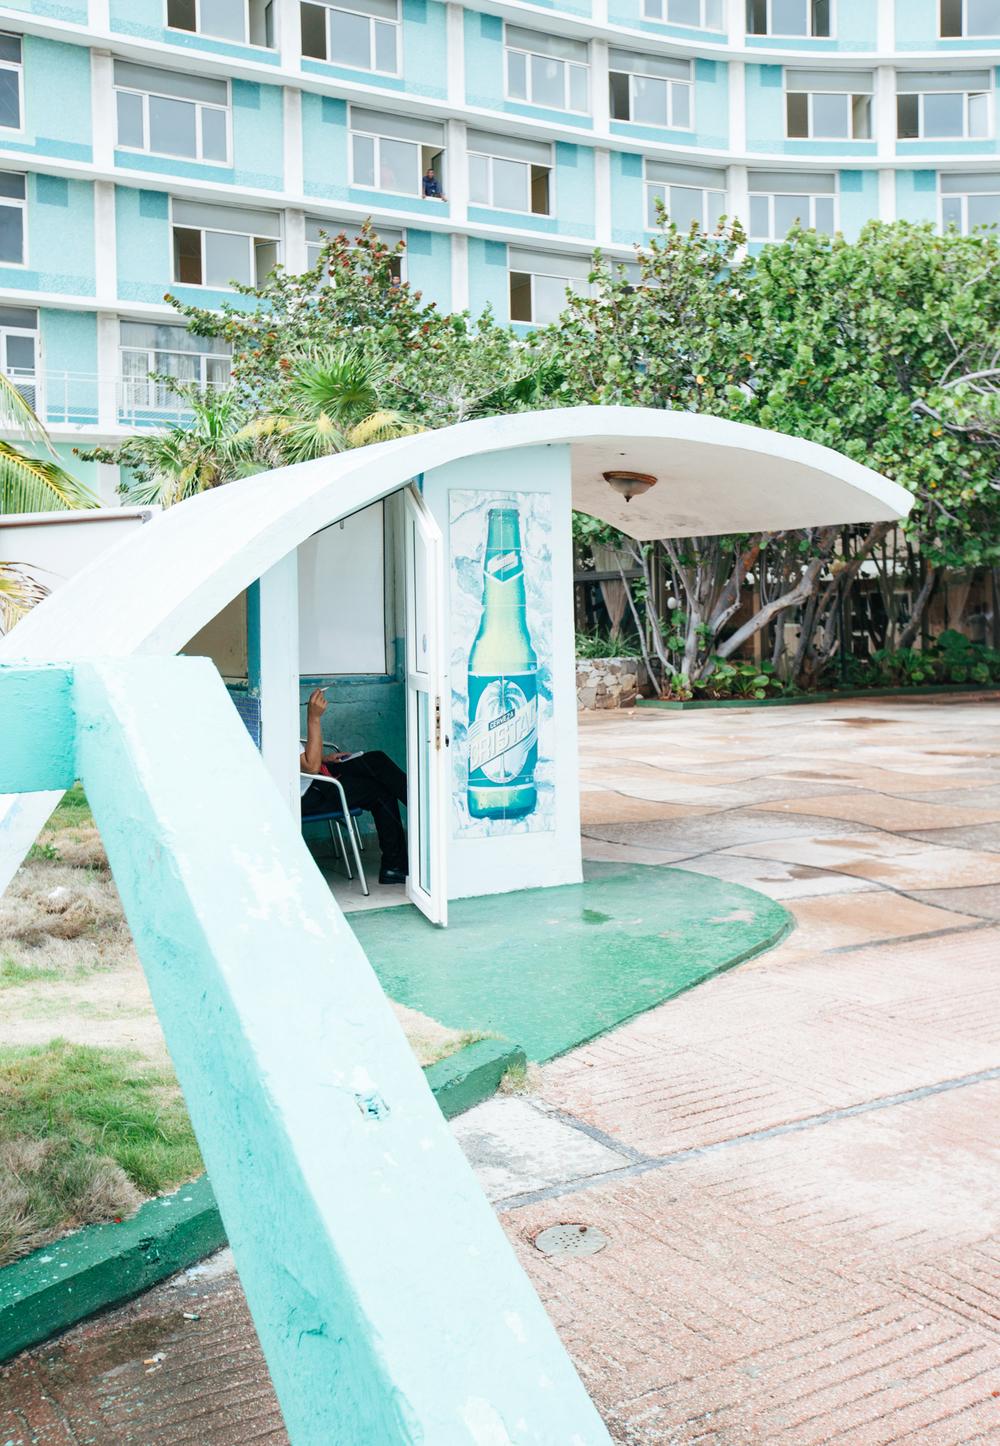 Julie_Cuba_Architecture_15.jpg